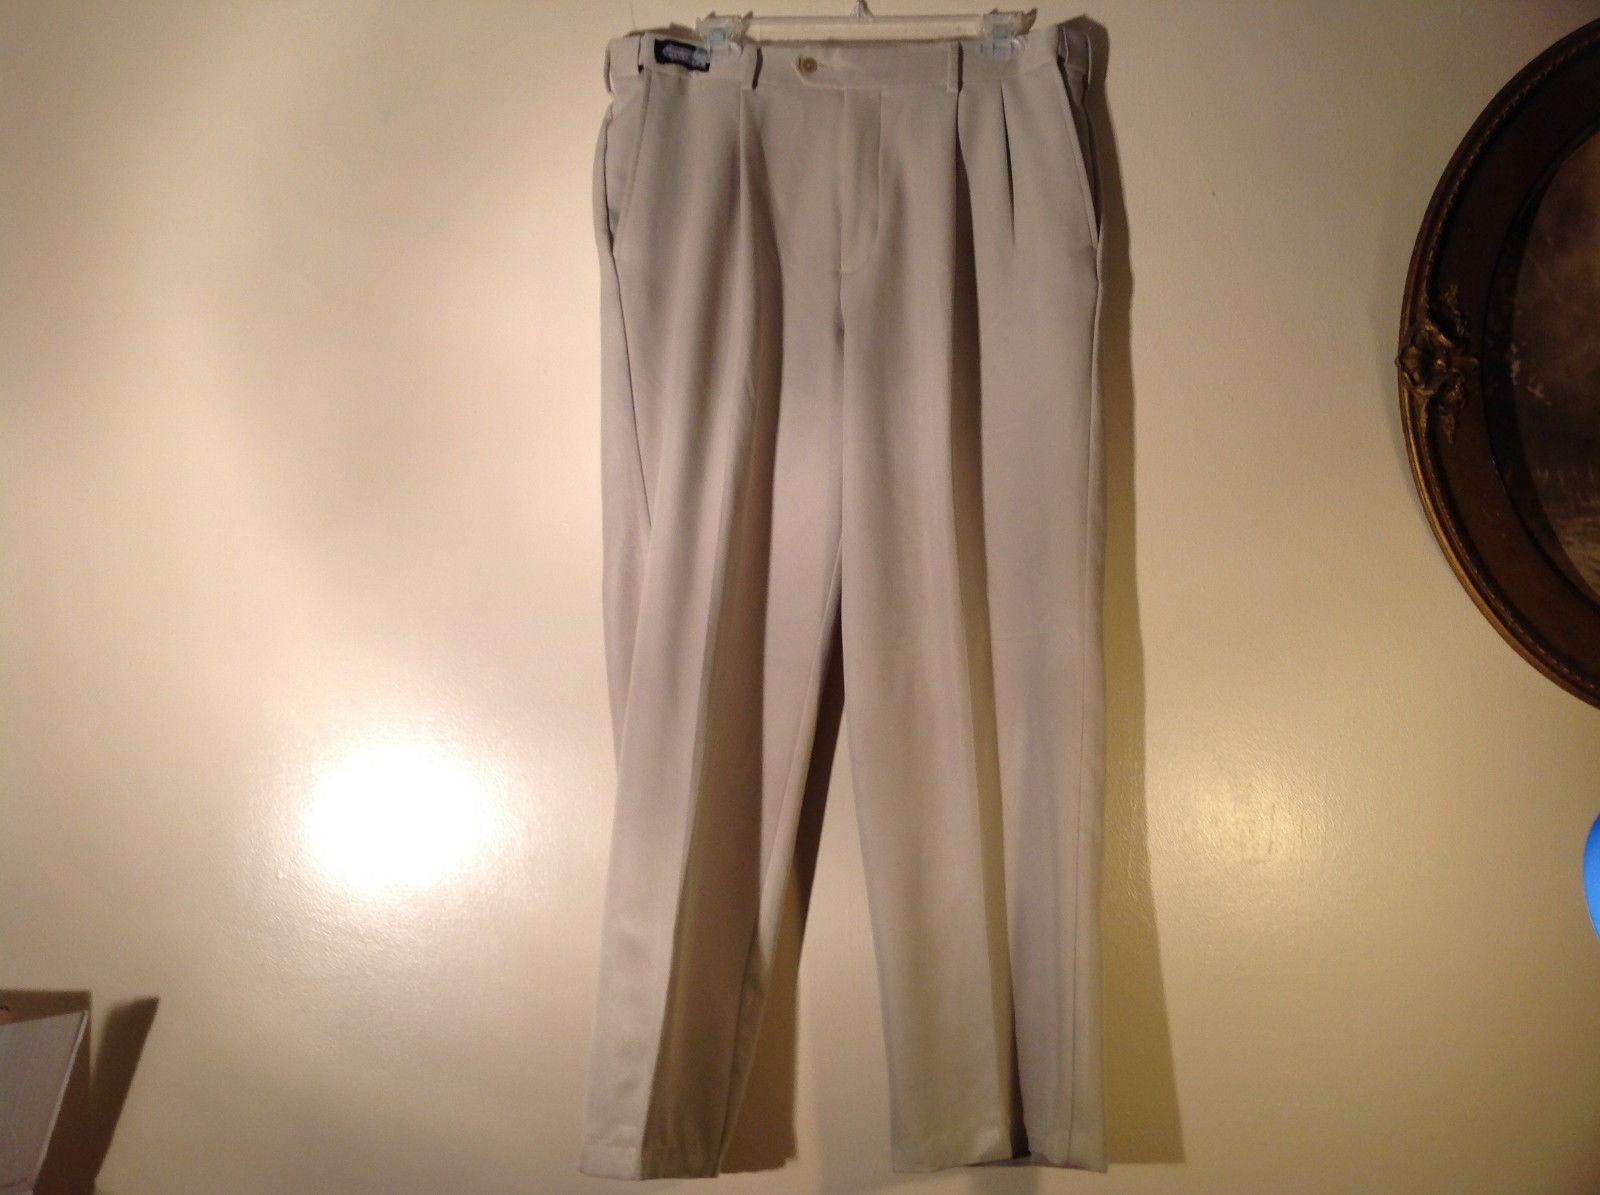 Savane Light Beige Dress Pants Comfort Plus Waistband Size 36W by 29L